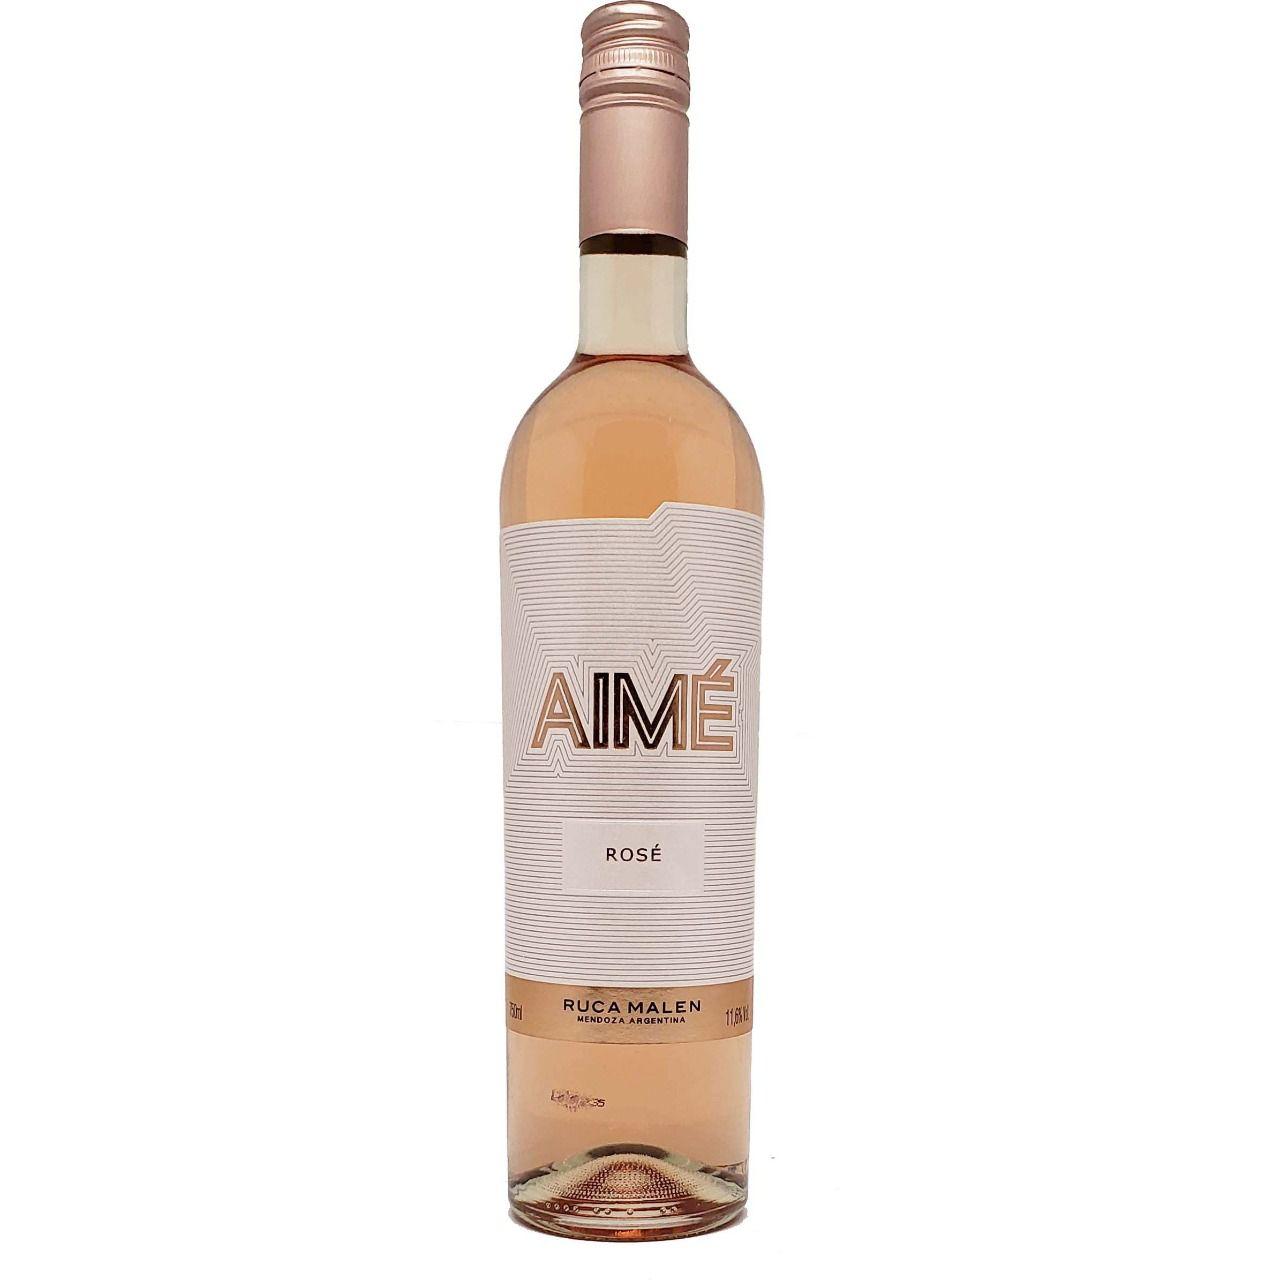 Vinho Rosé Aimé Ruca Malen - 750ml -